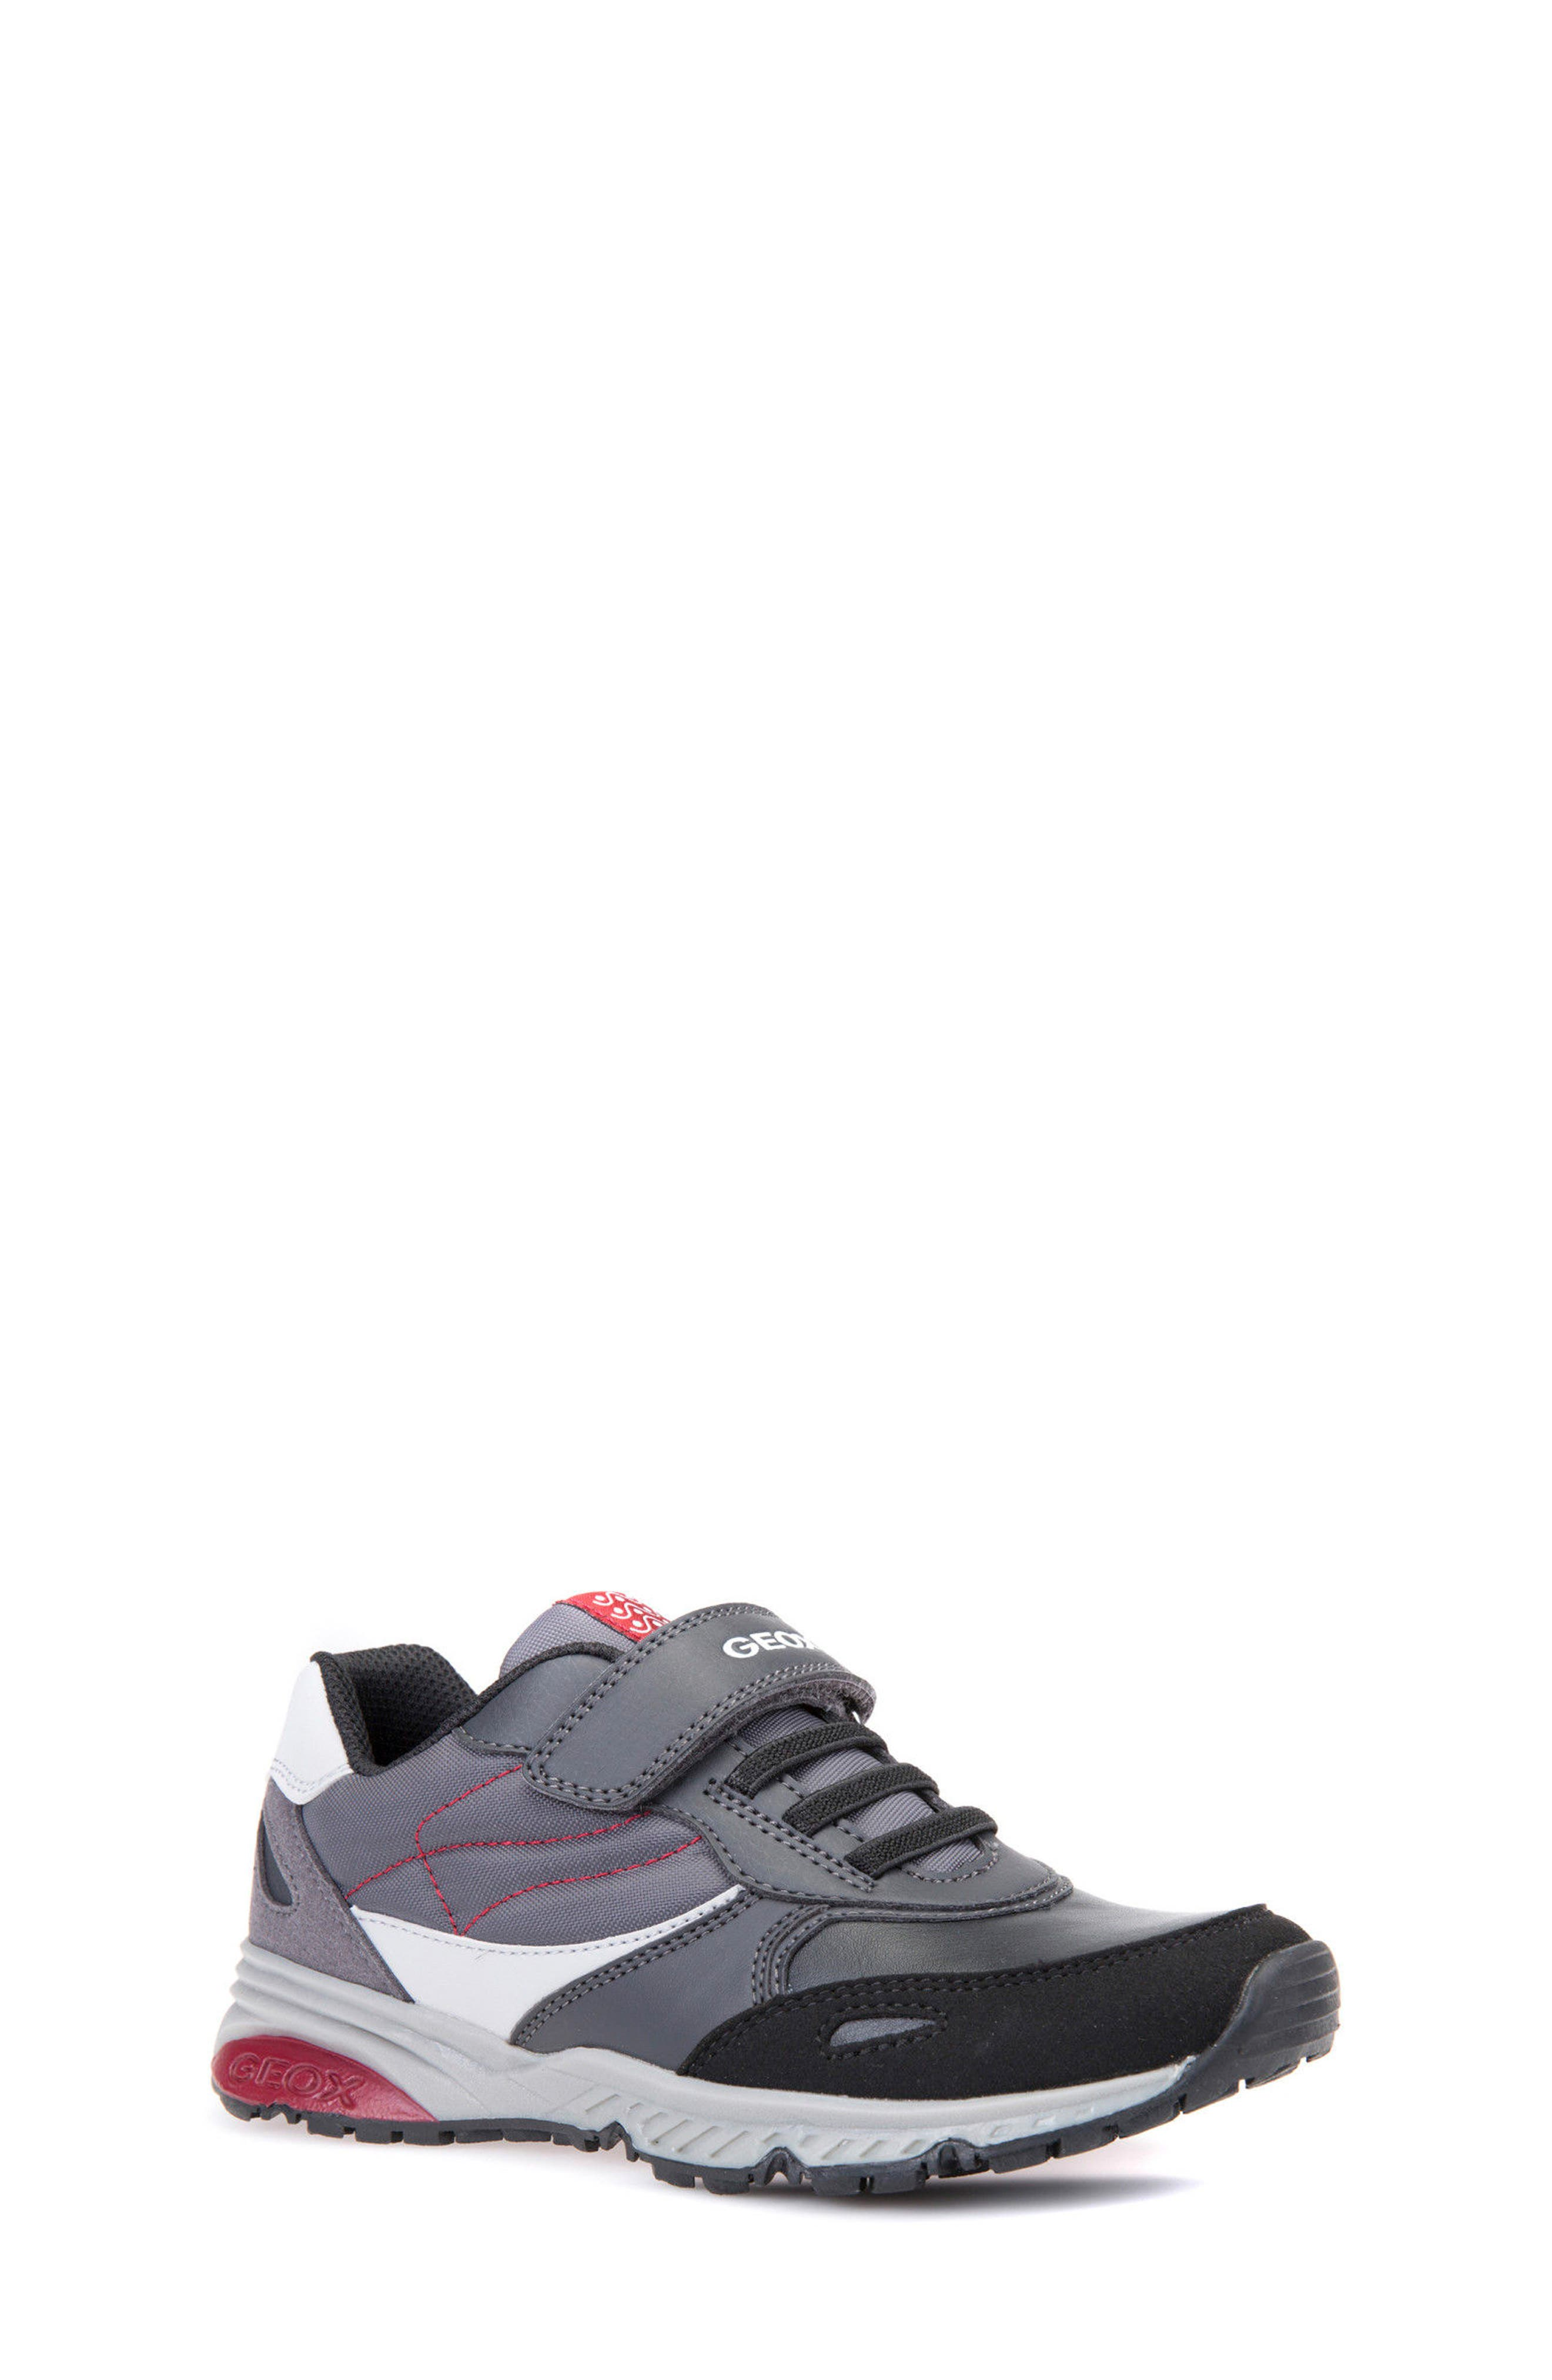 Jr Bernie Sneaker,                             Main thumbnail 1, color,                             074